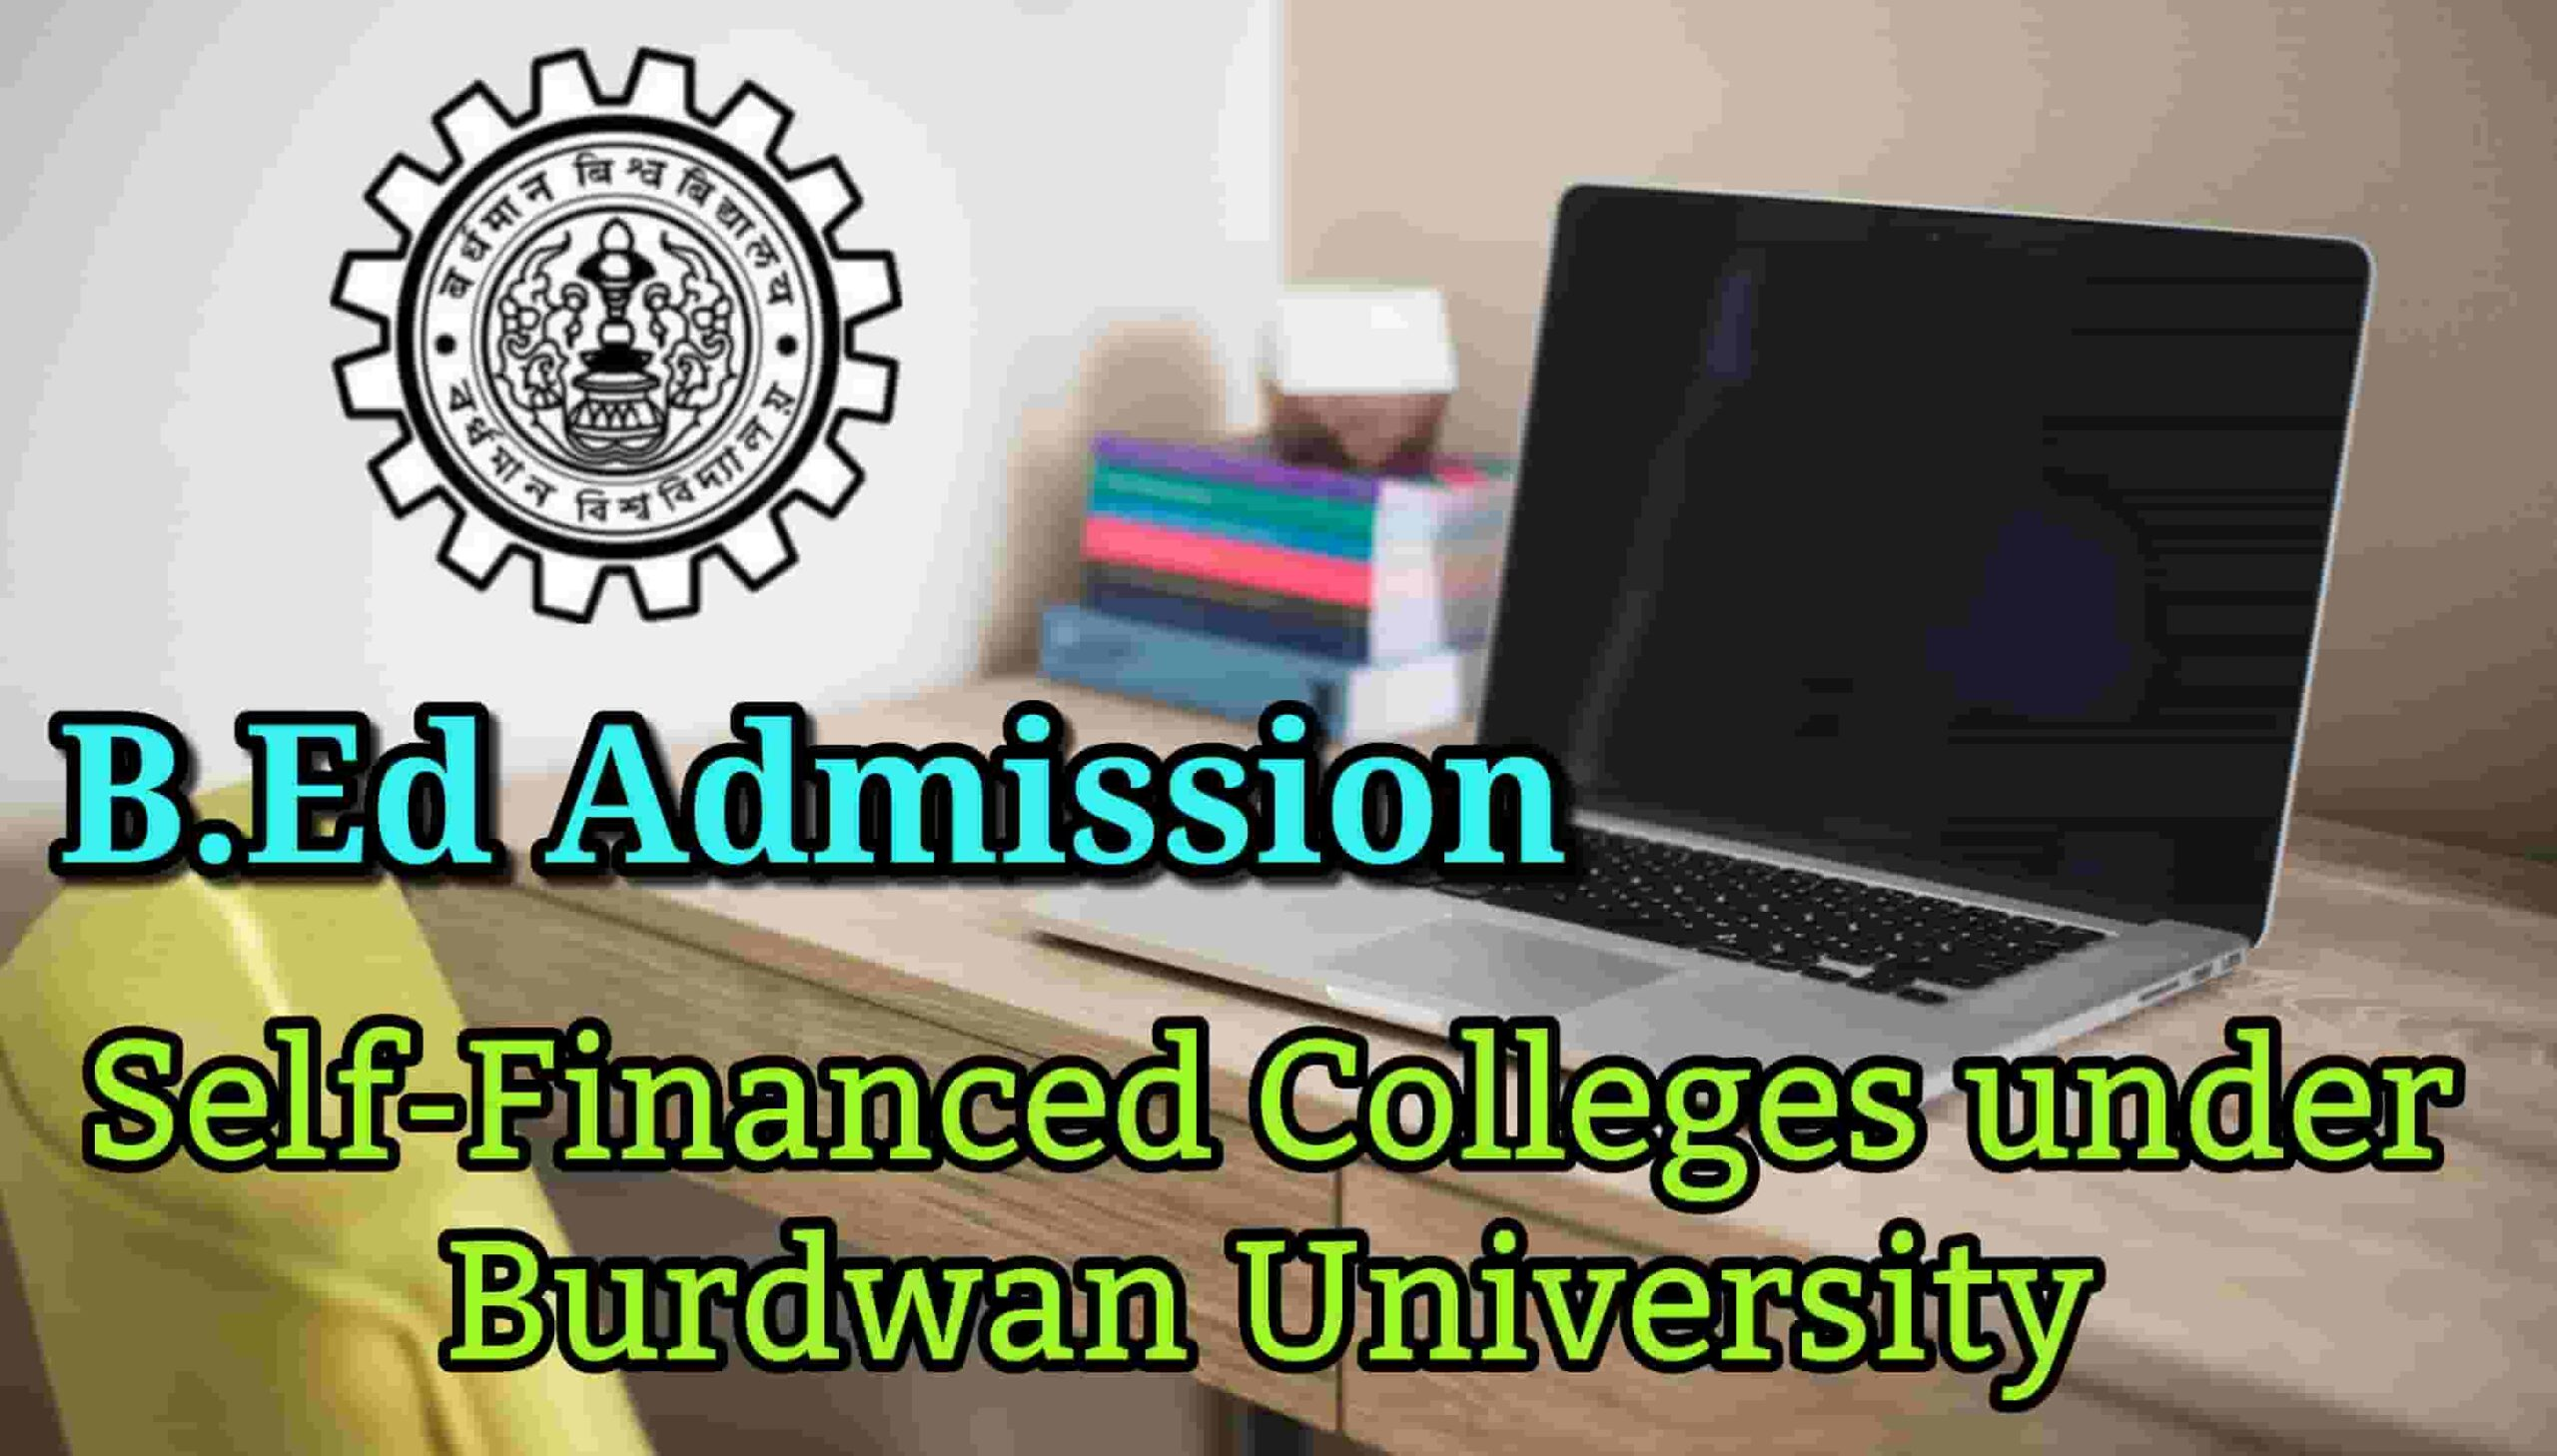 B.Ed Admission 2019 under Burdwan University